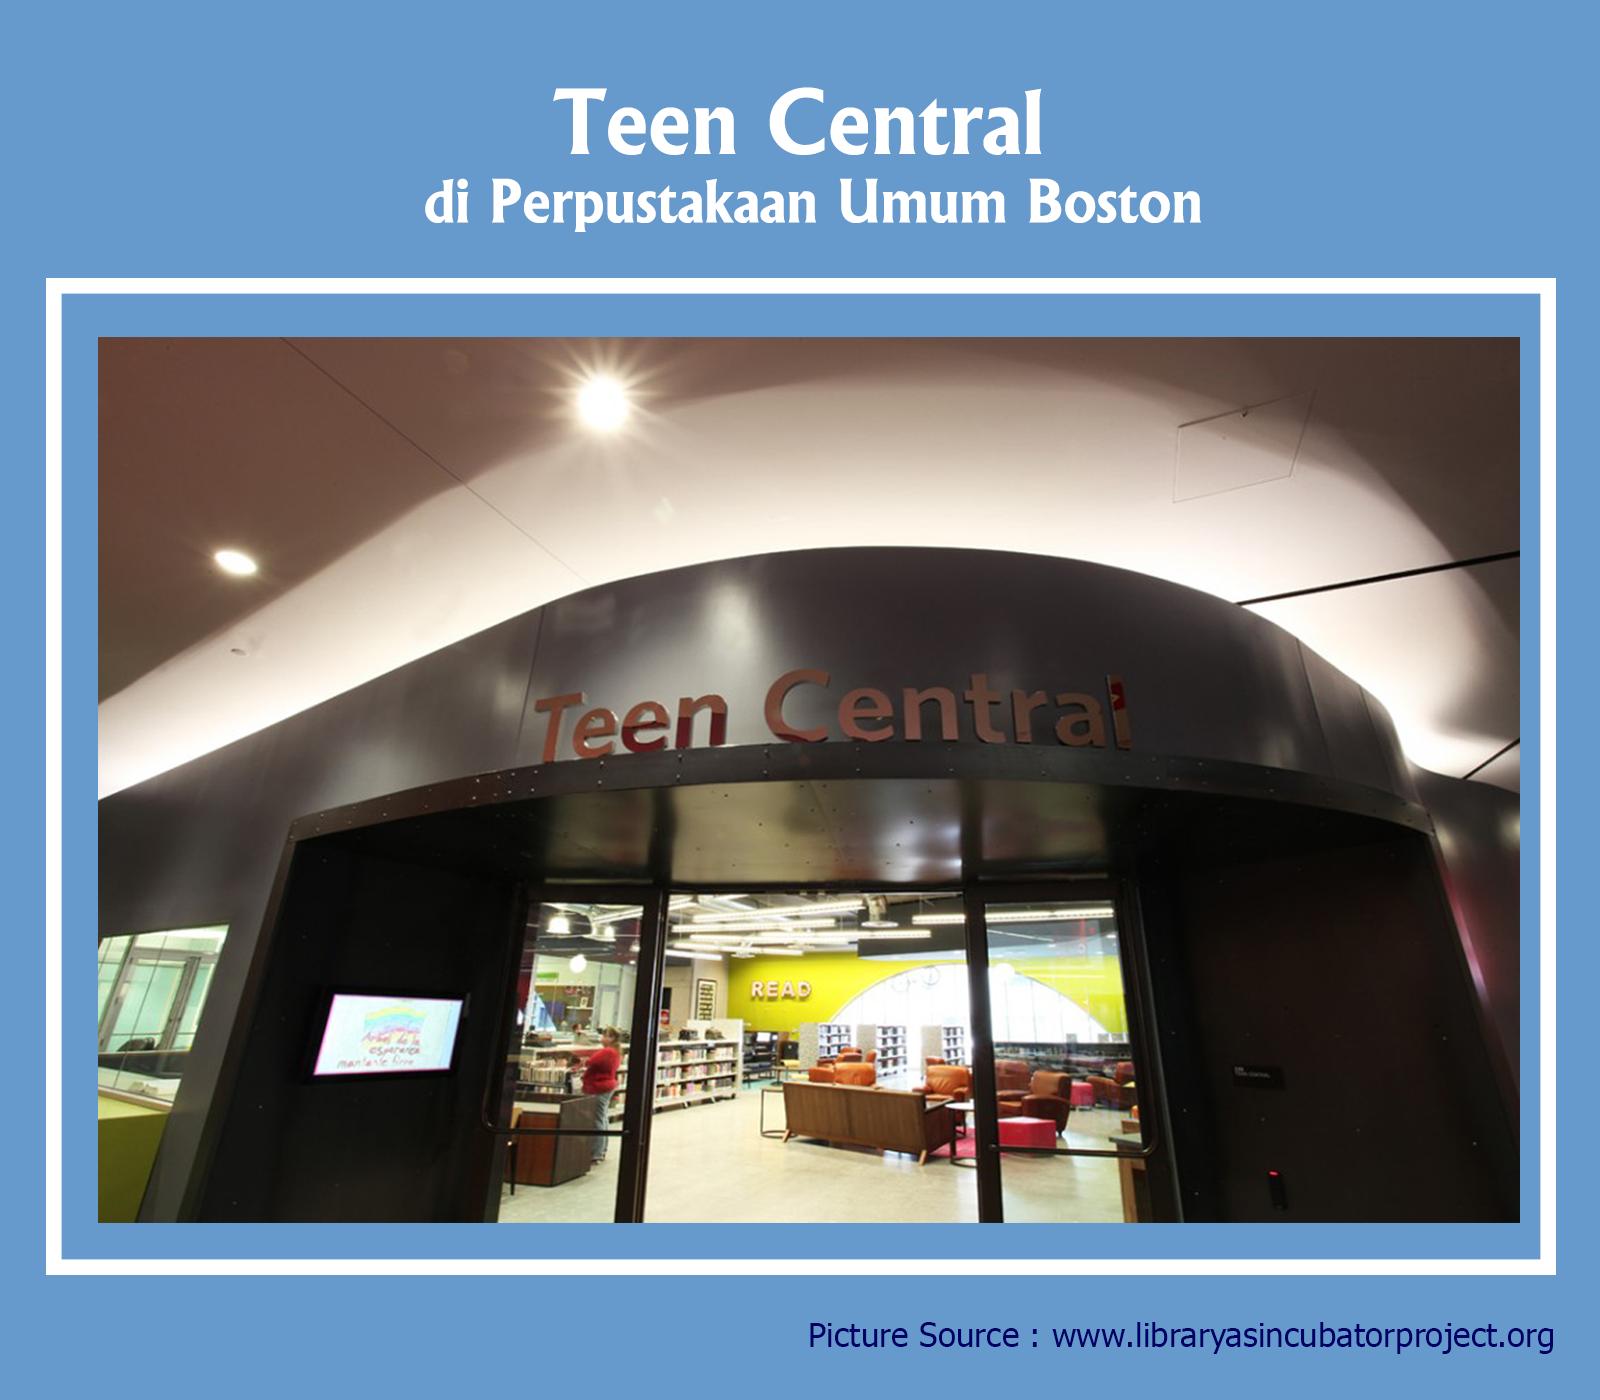 Teen central BPL